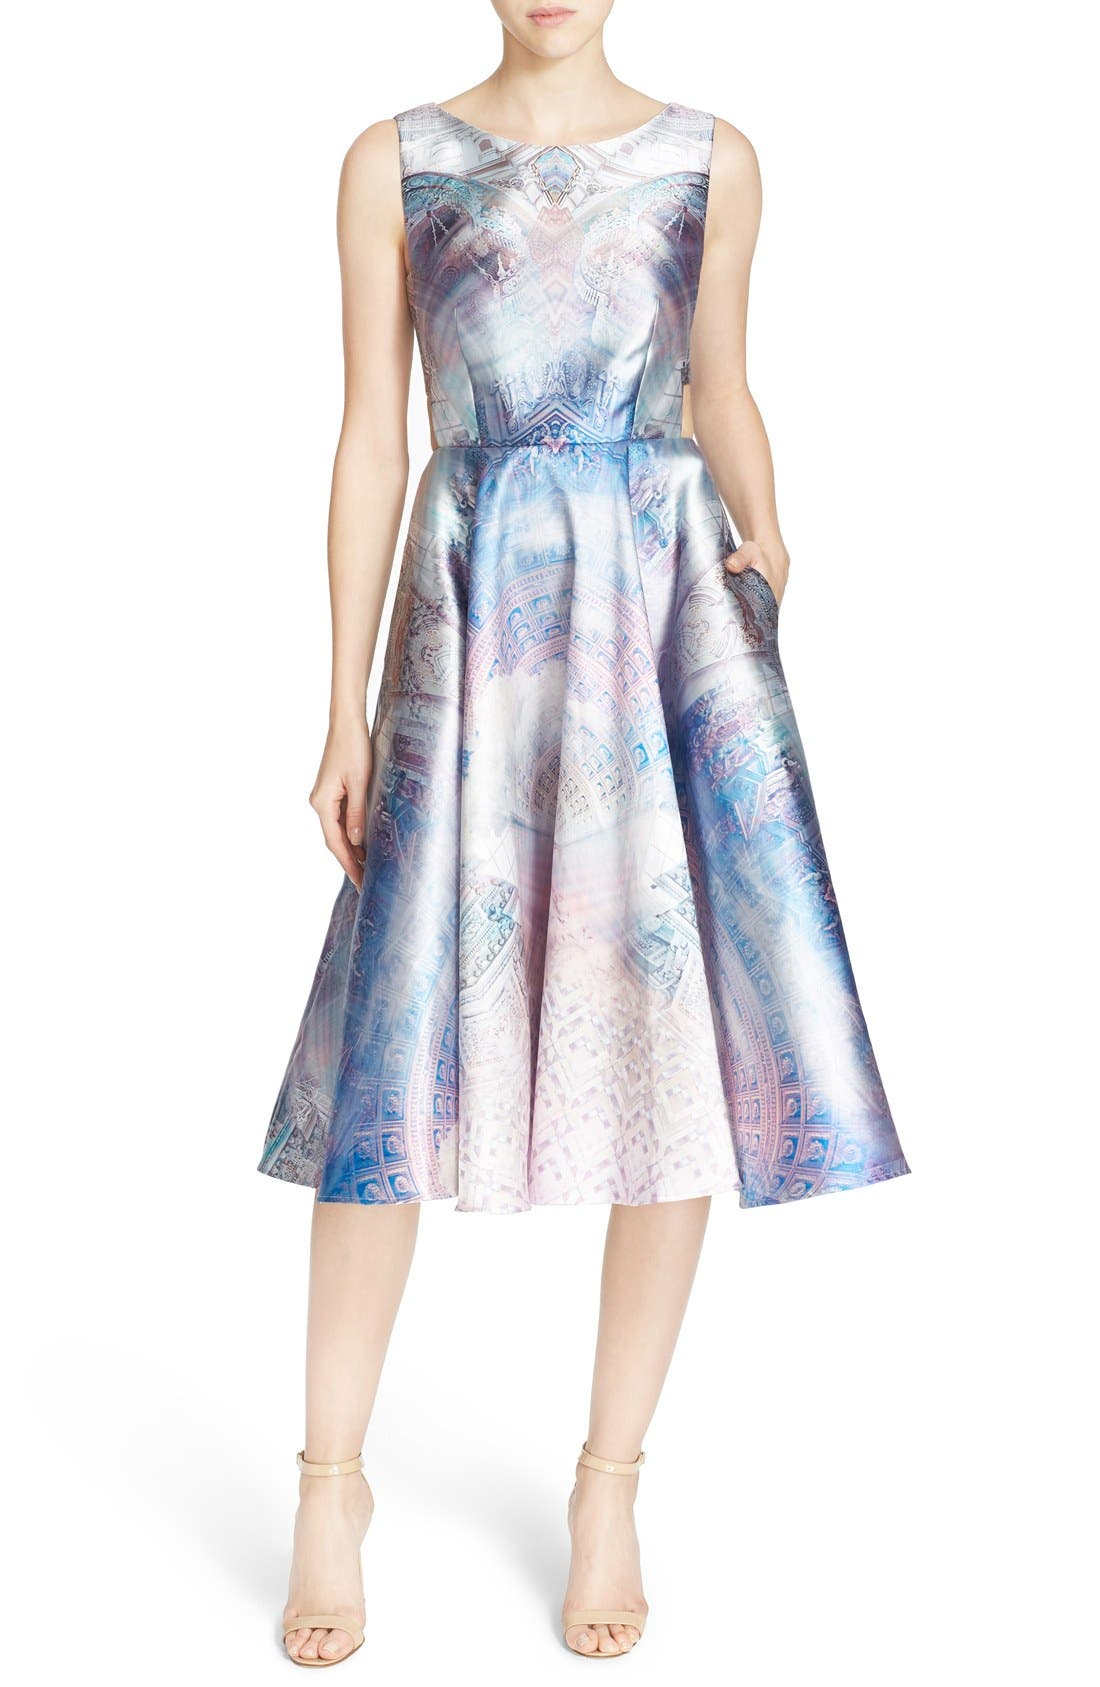 Alternate Image 1 Selected - Ted Baker London 'Larin' Print Fit & Flare Dress